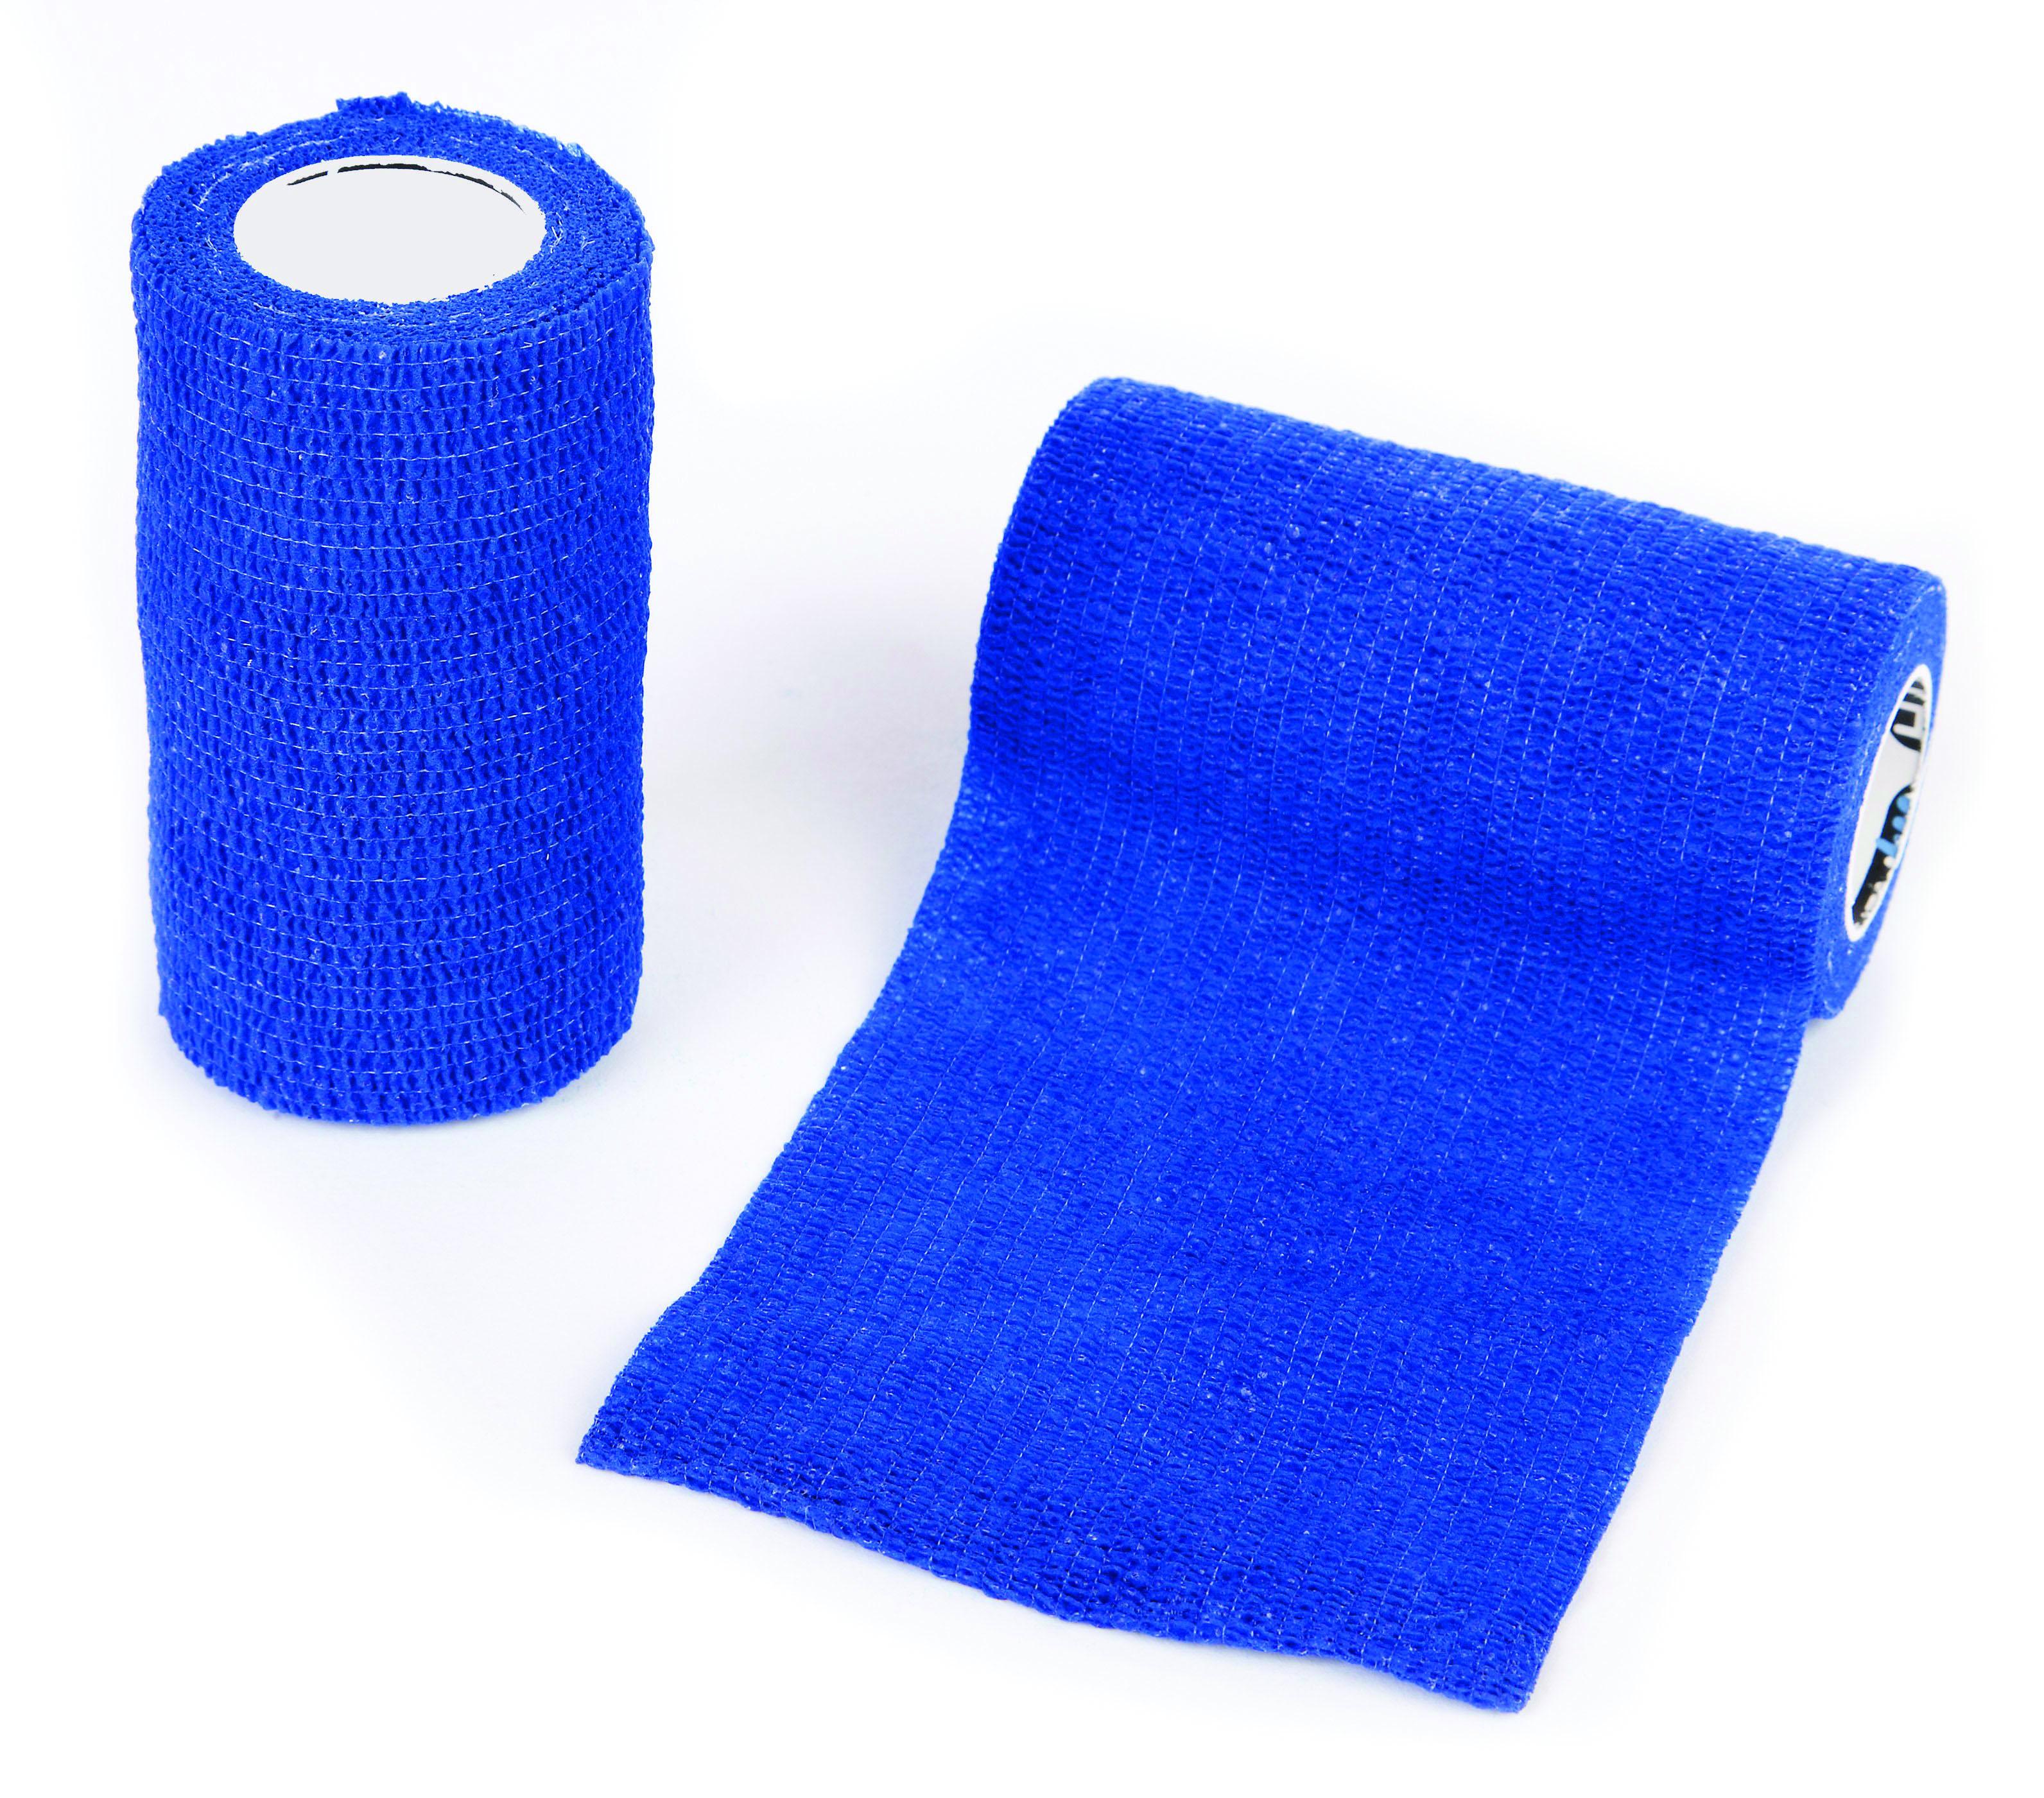 HyHEALTH Sportwrap Bandages 10cm x 4.5m